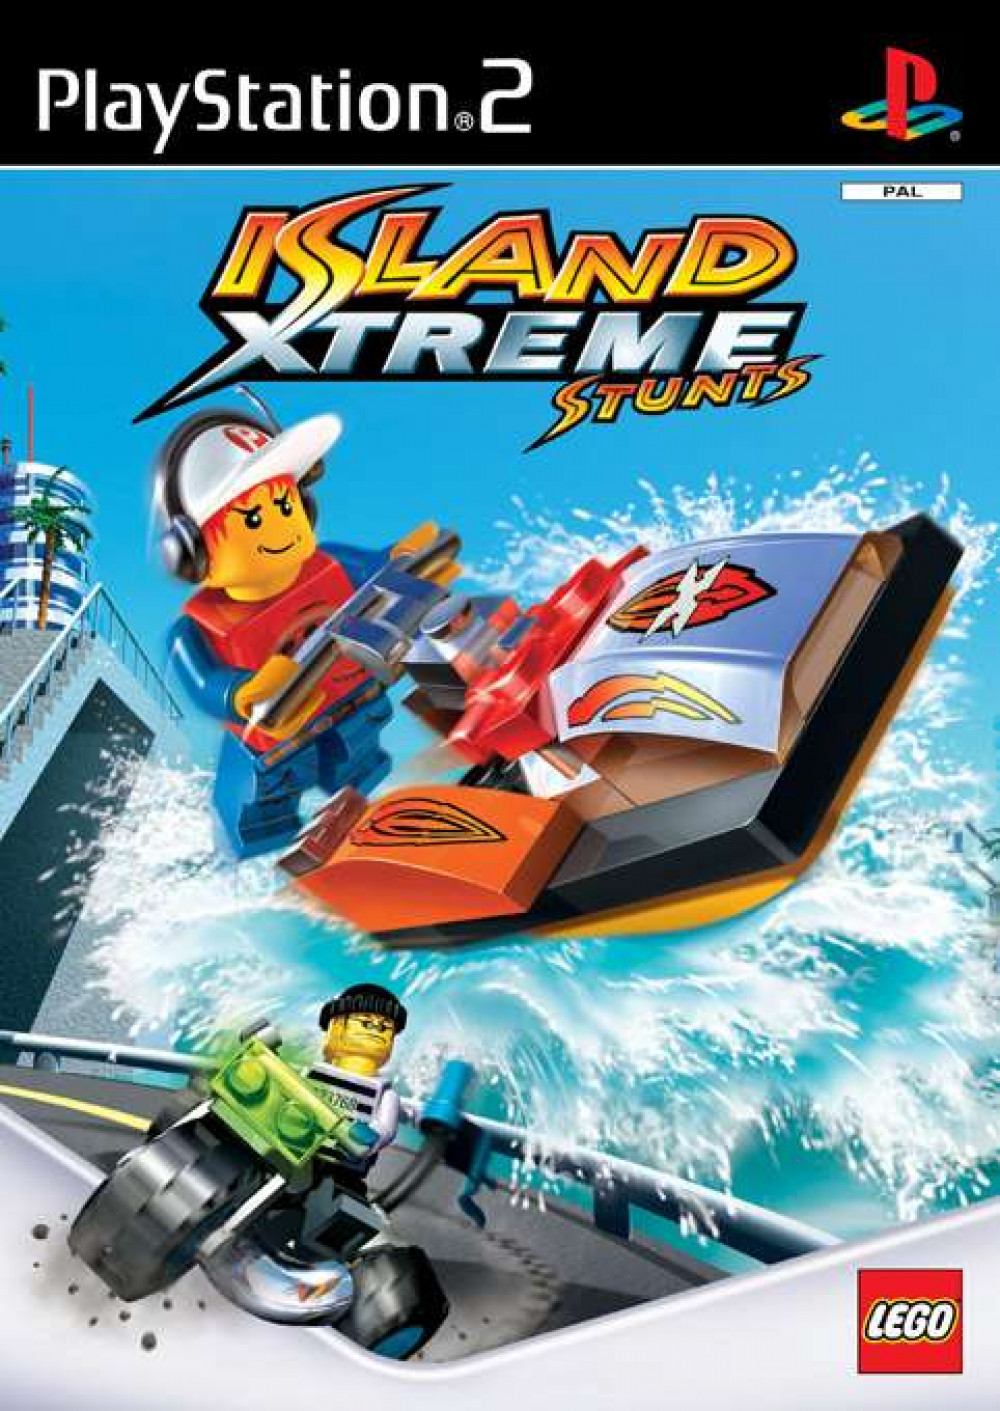 Lego Island Xtreme Stunts PS2